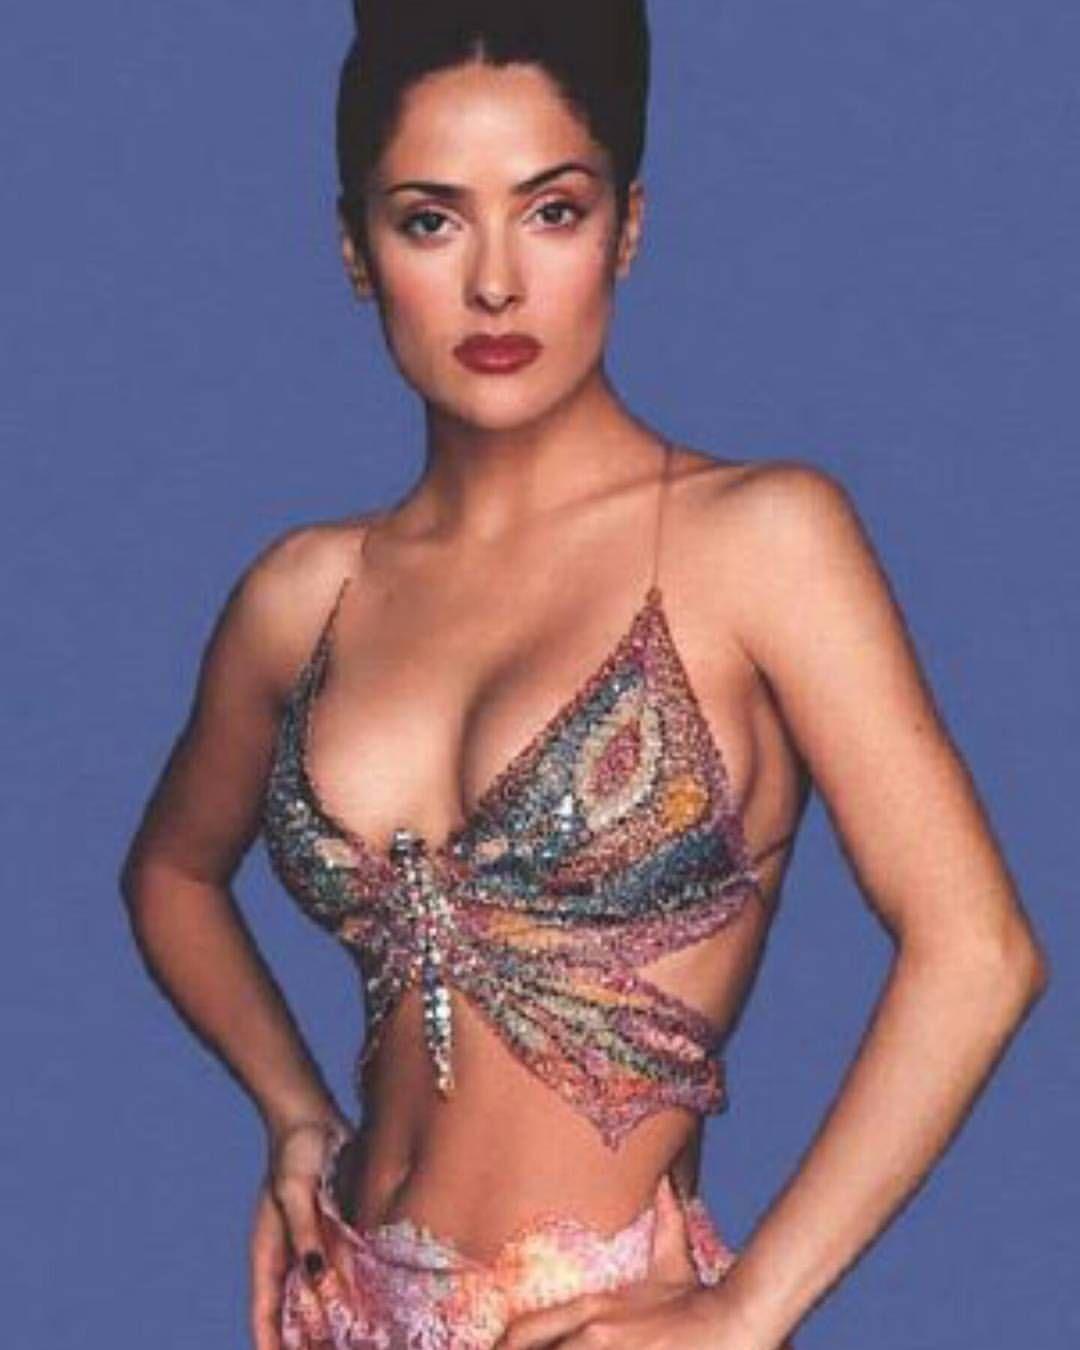 4de0aeb1ae Salma #salmahayek #salma #90s #actress #pretty #beauty #90sgirlcrush  #ilovethe90s #butterfly #popculture #fame #moviestar #girlpower✌